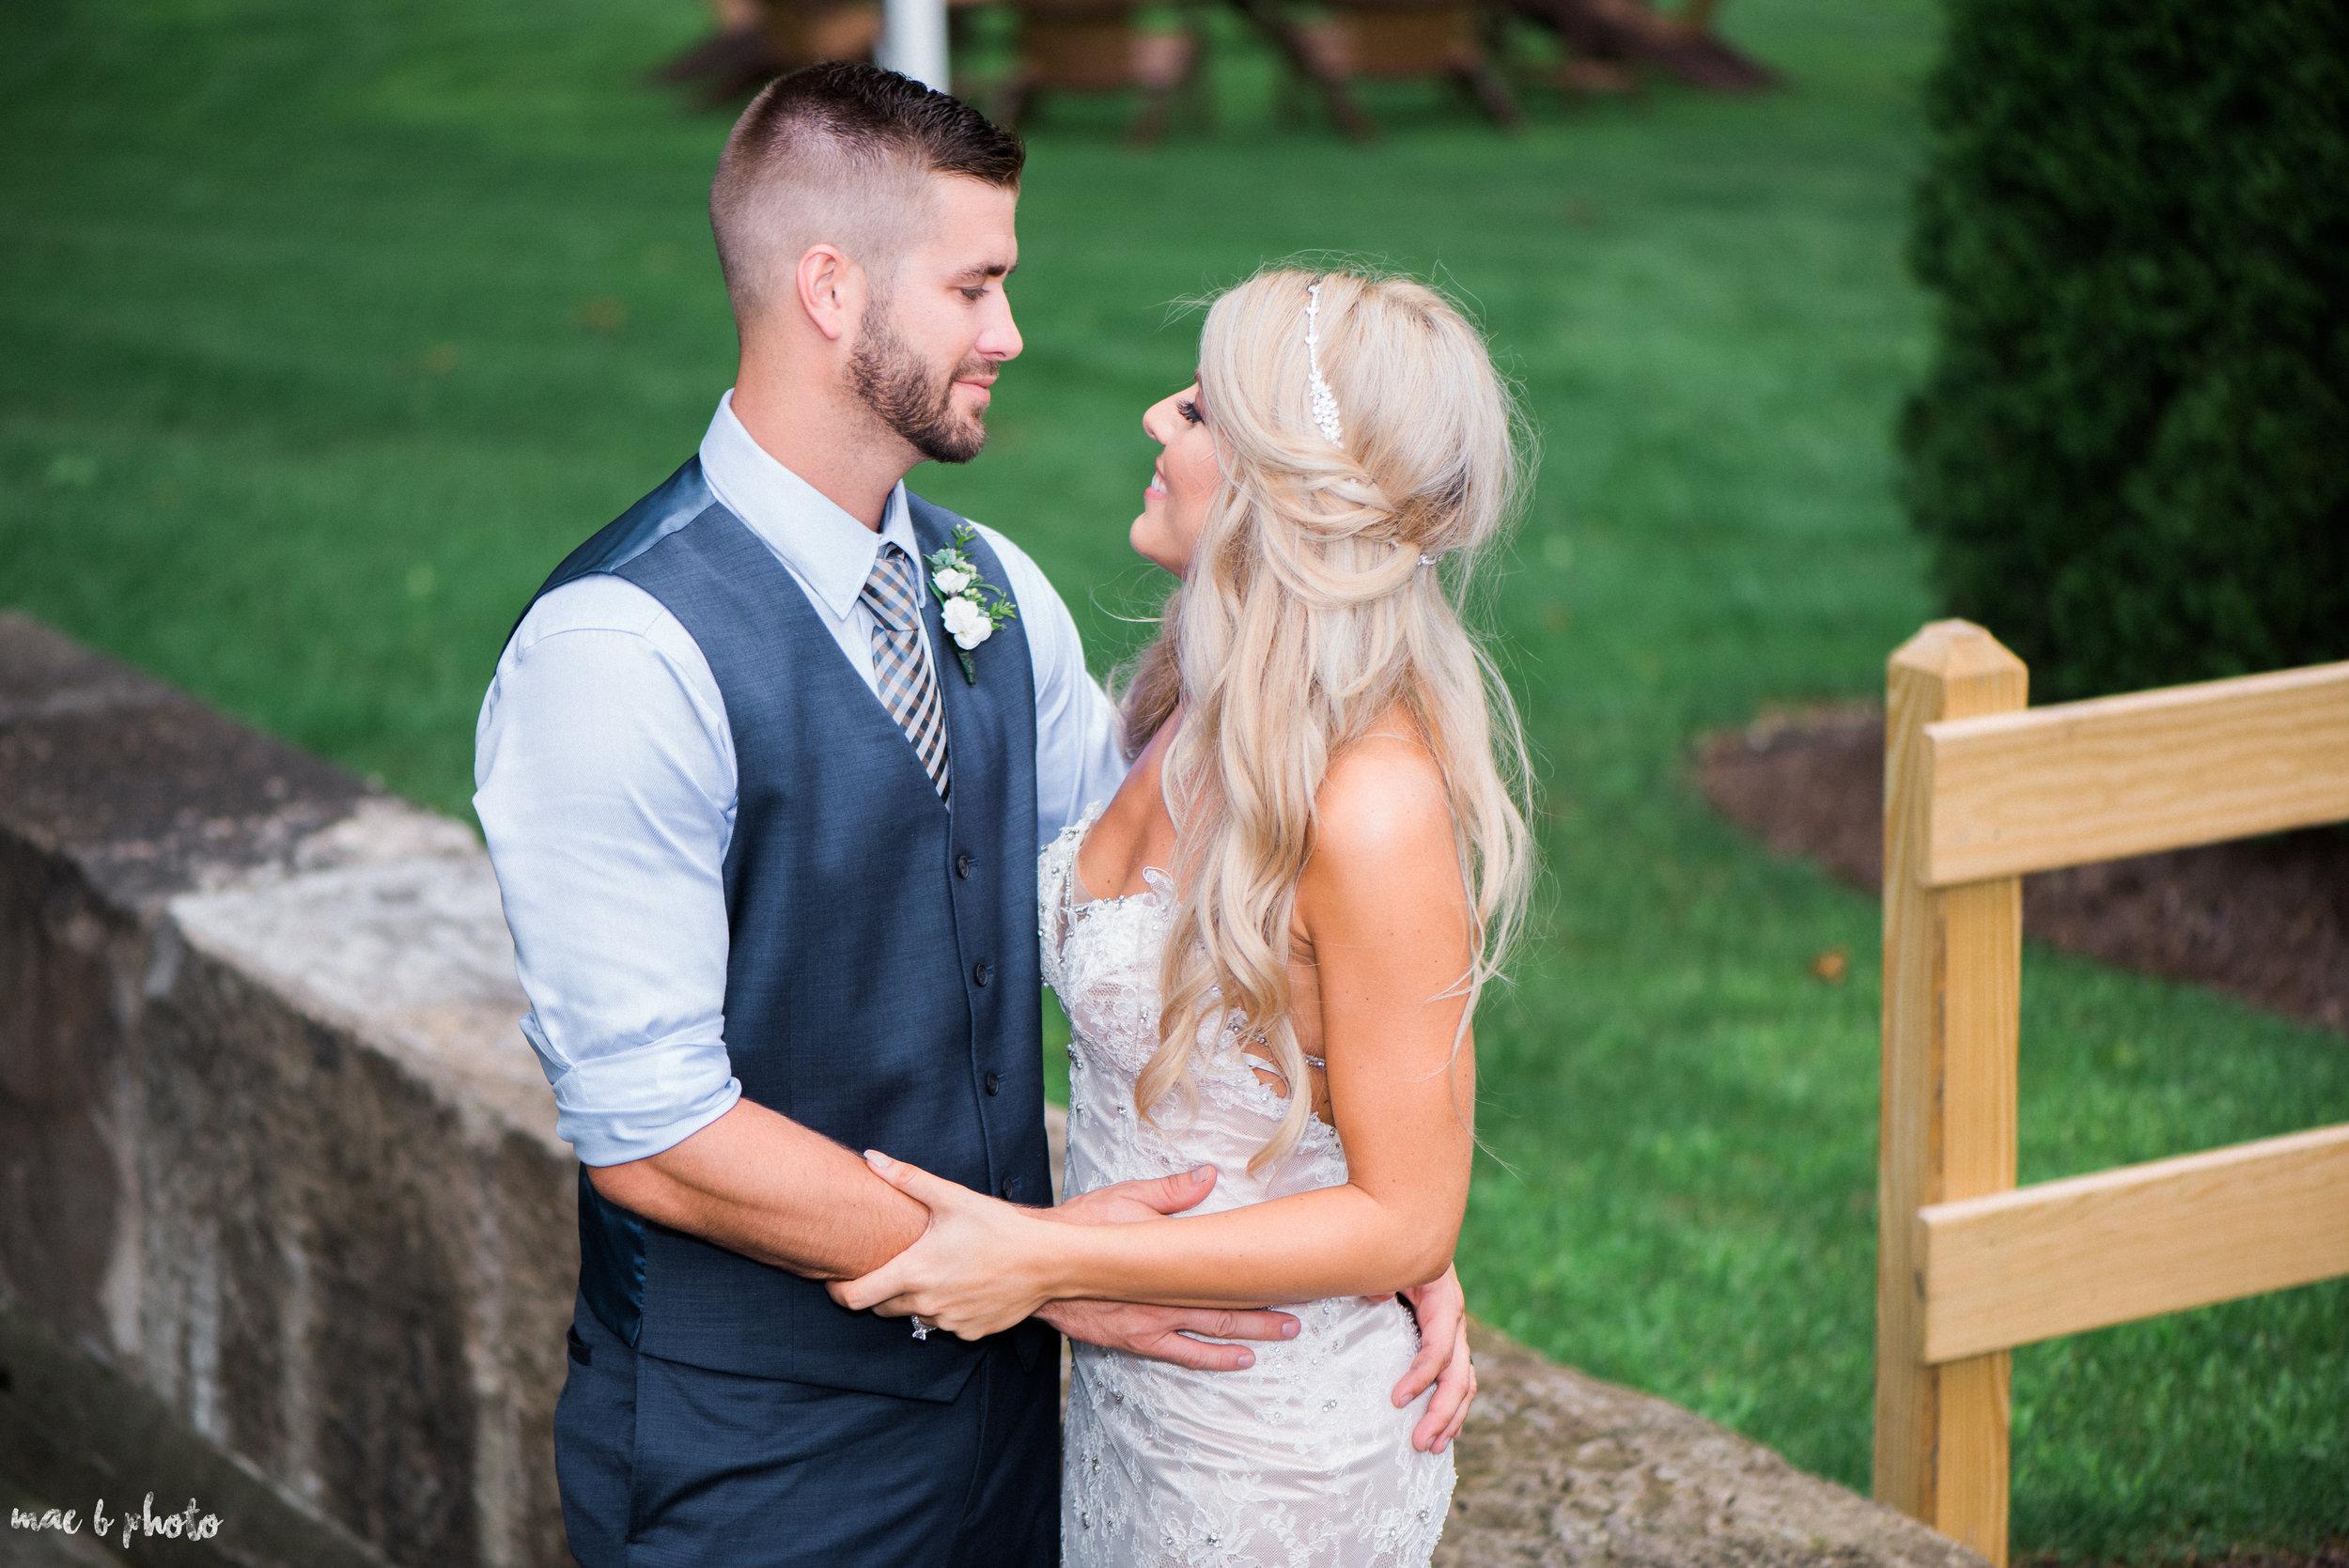 Tara & Matt's Elegant Backyard Summer Wedding in Kinsman, Ohio-75.jpg